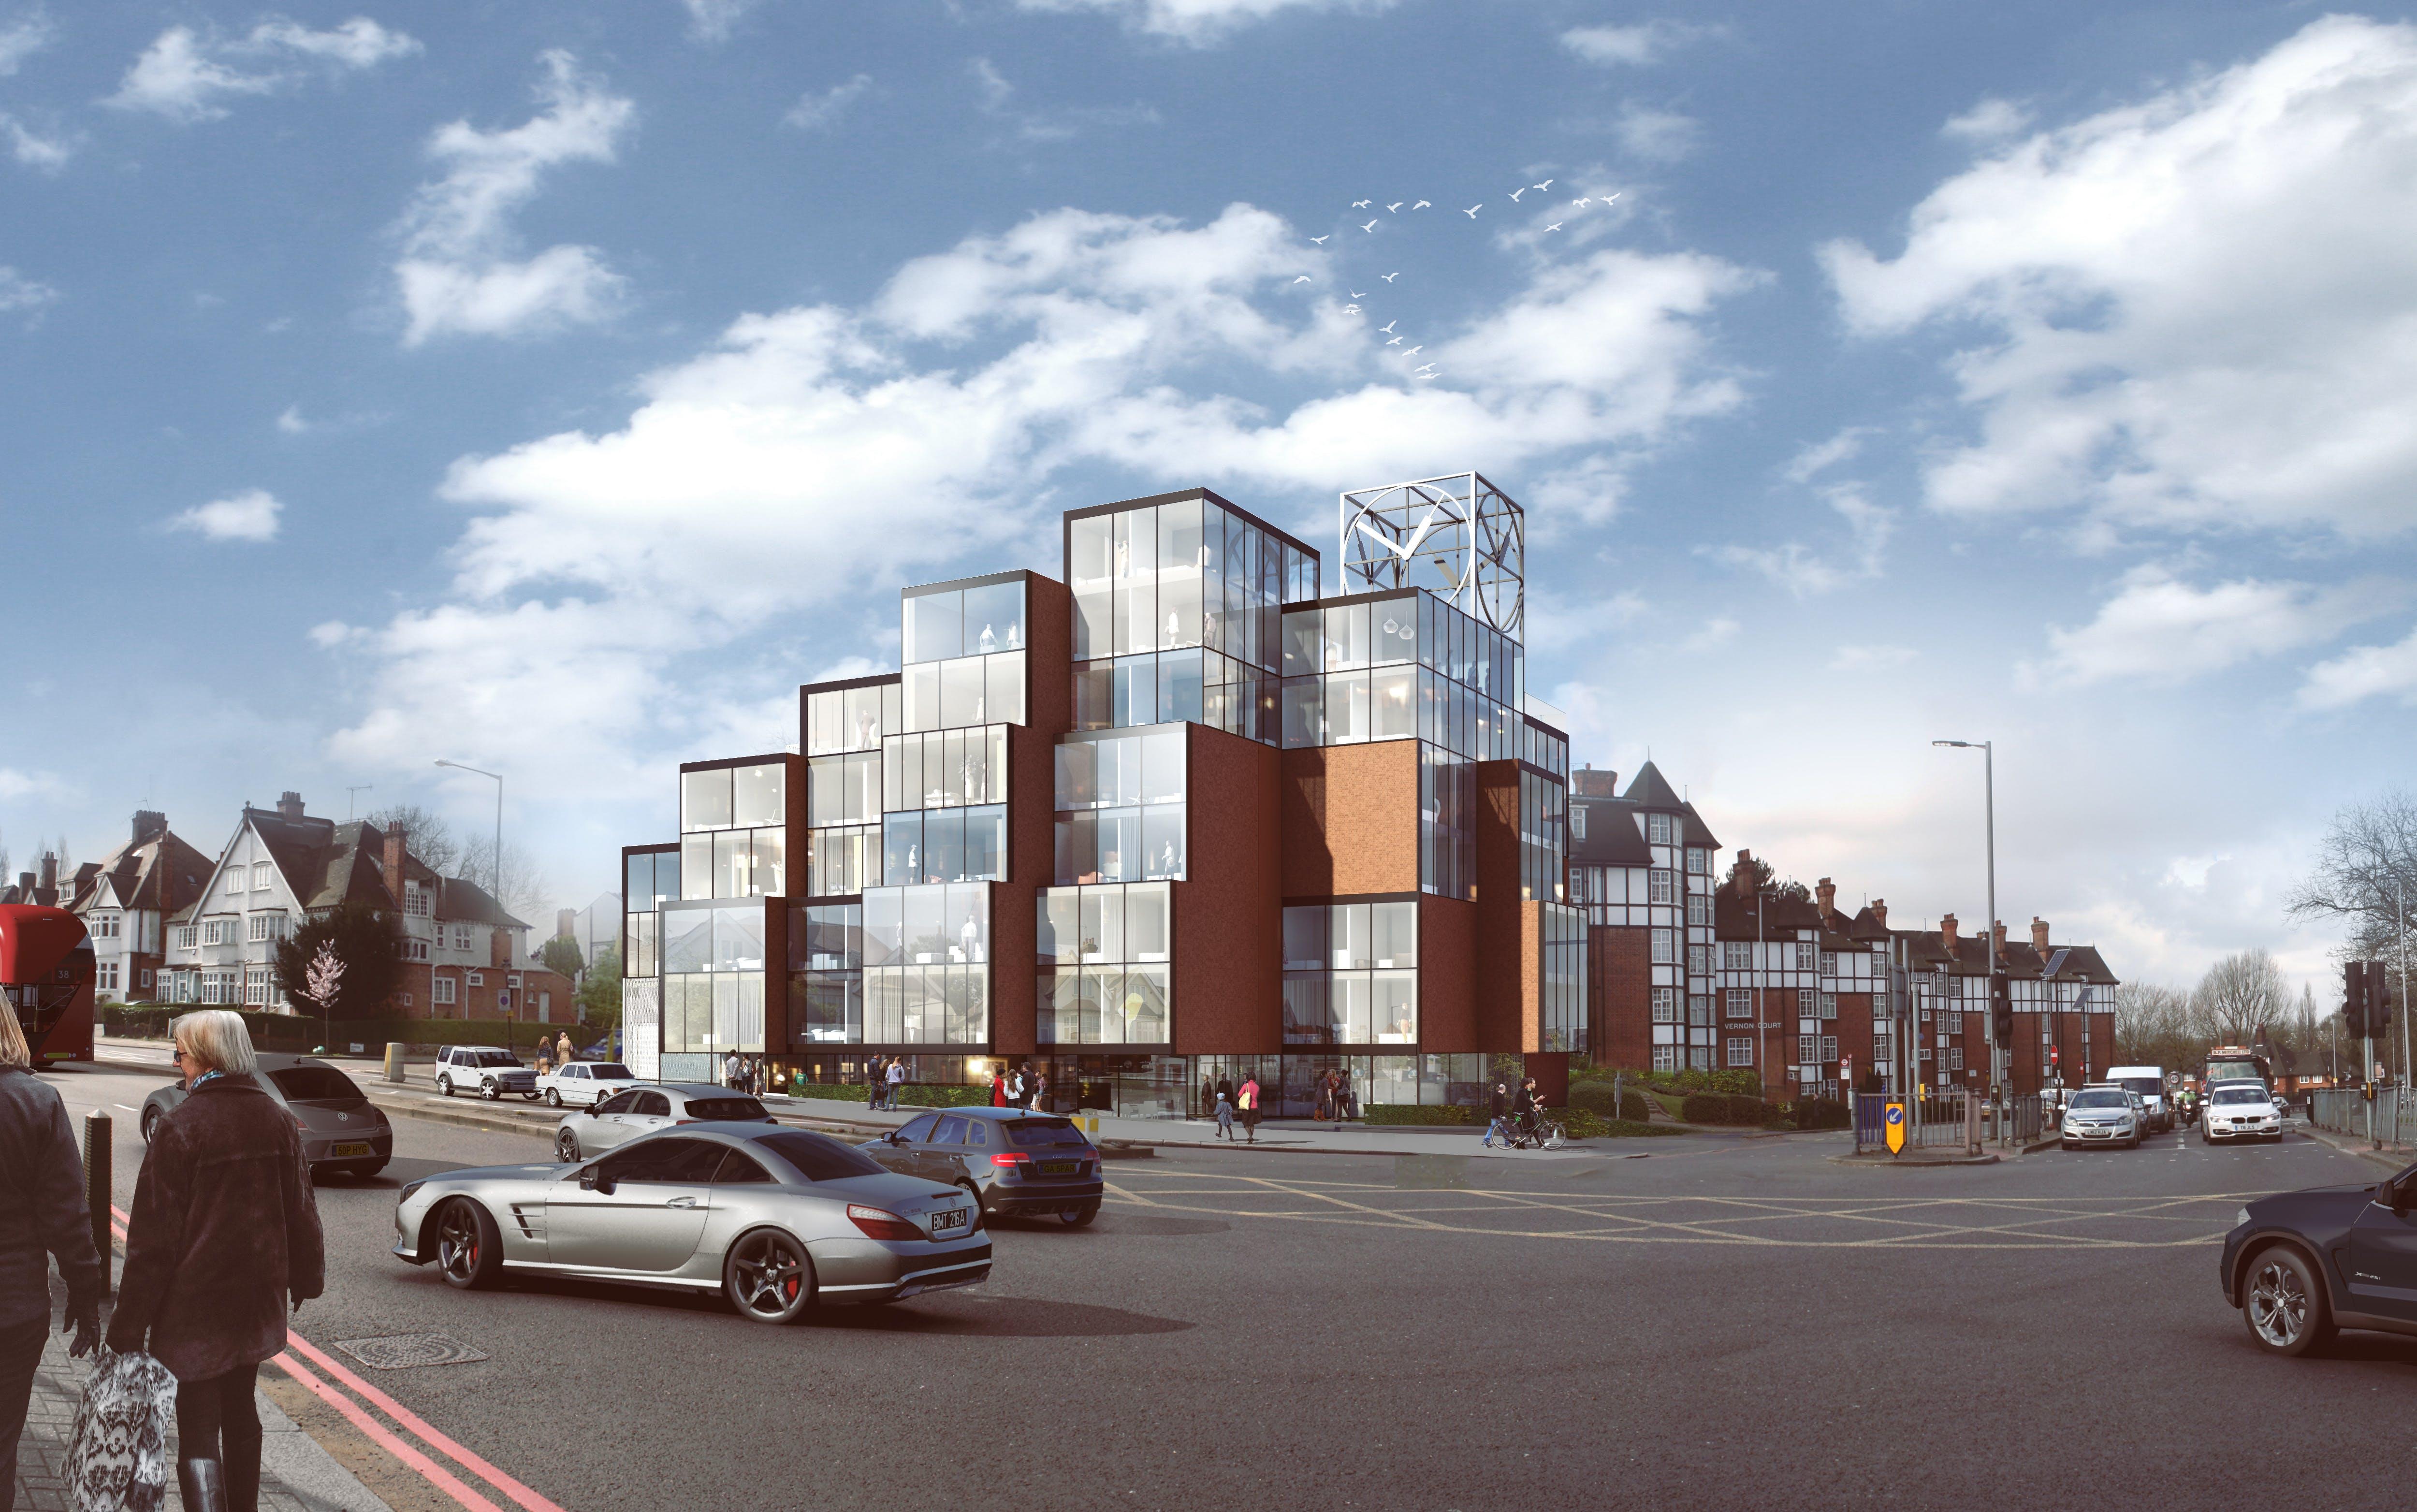 Pixelated Housing gets the green light in Barnet, London | NEUBAU ...